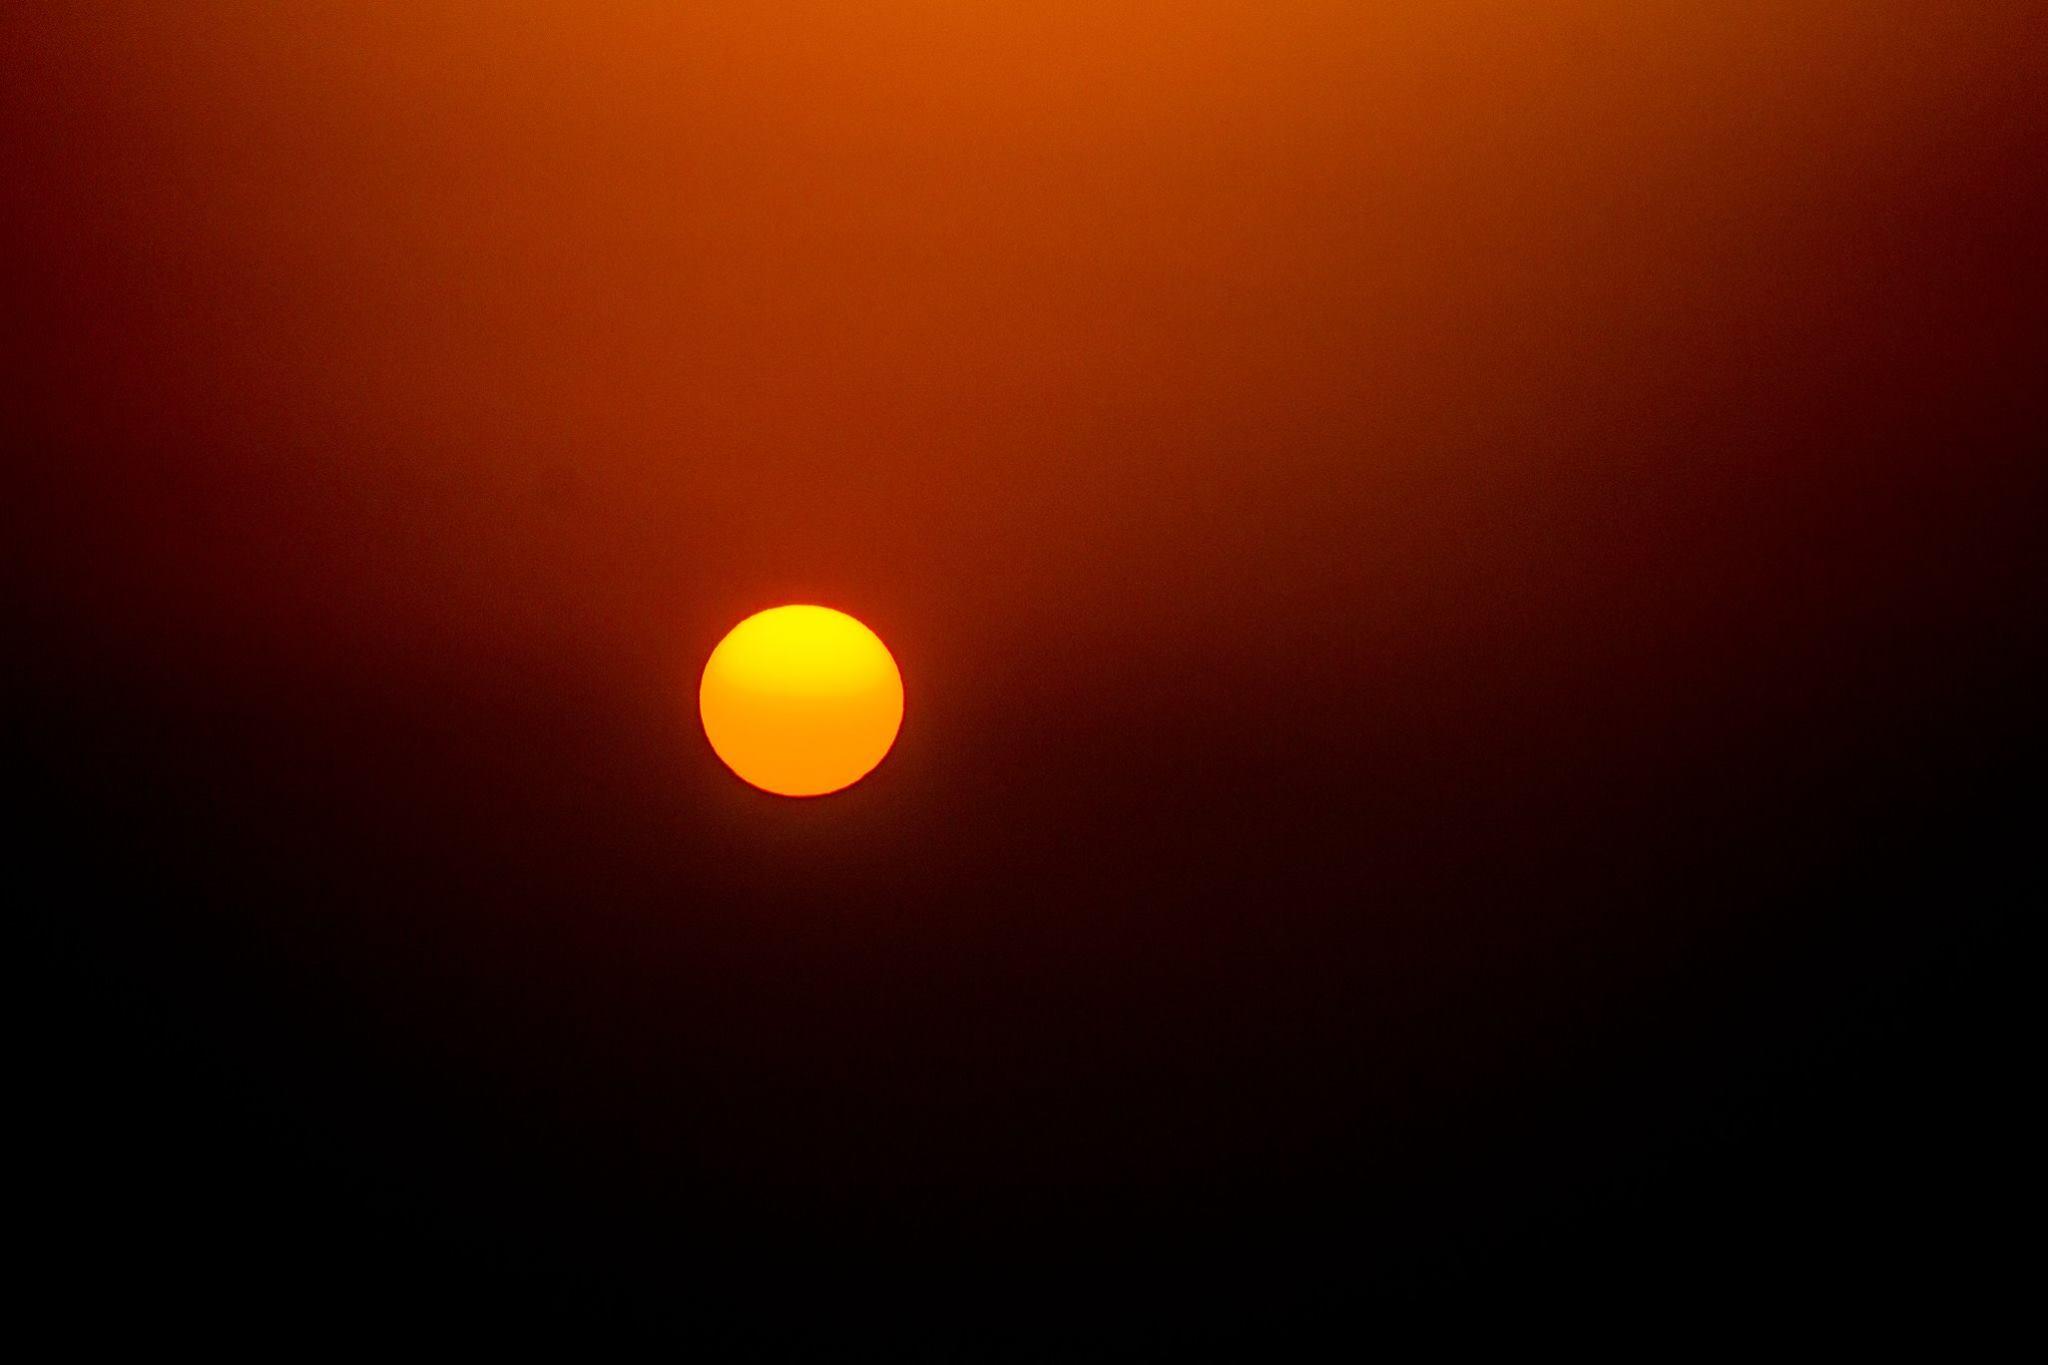 invite-to-paradise-sri-lanka-and-maldives-specialists-travel-agent-tour-operator-customer-review--feedback-joel-rhian-sunset.jpg